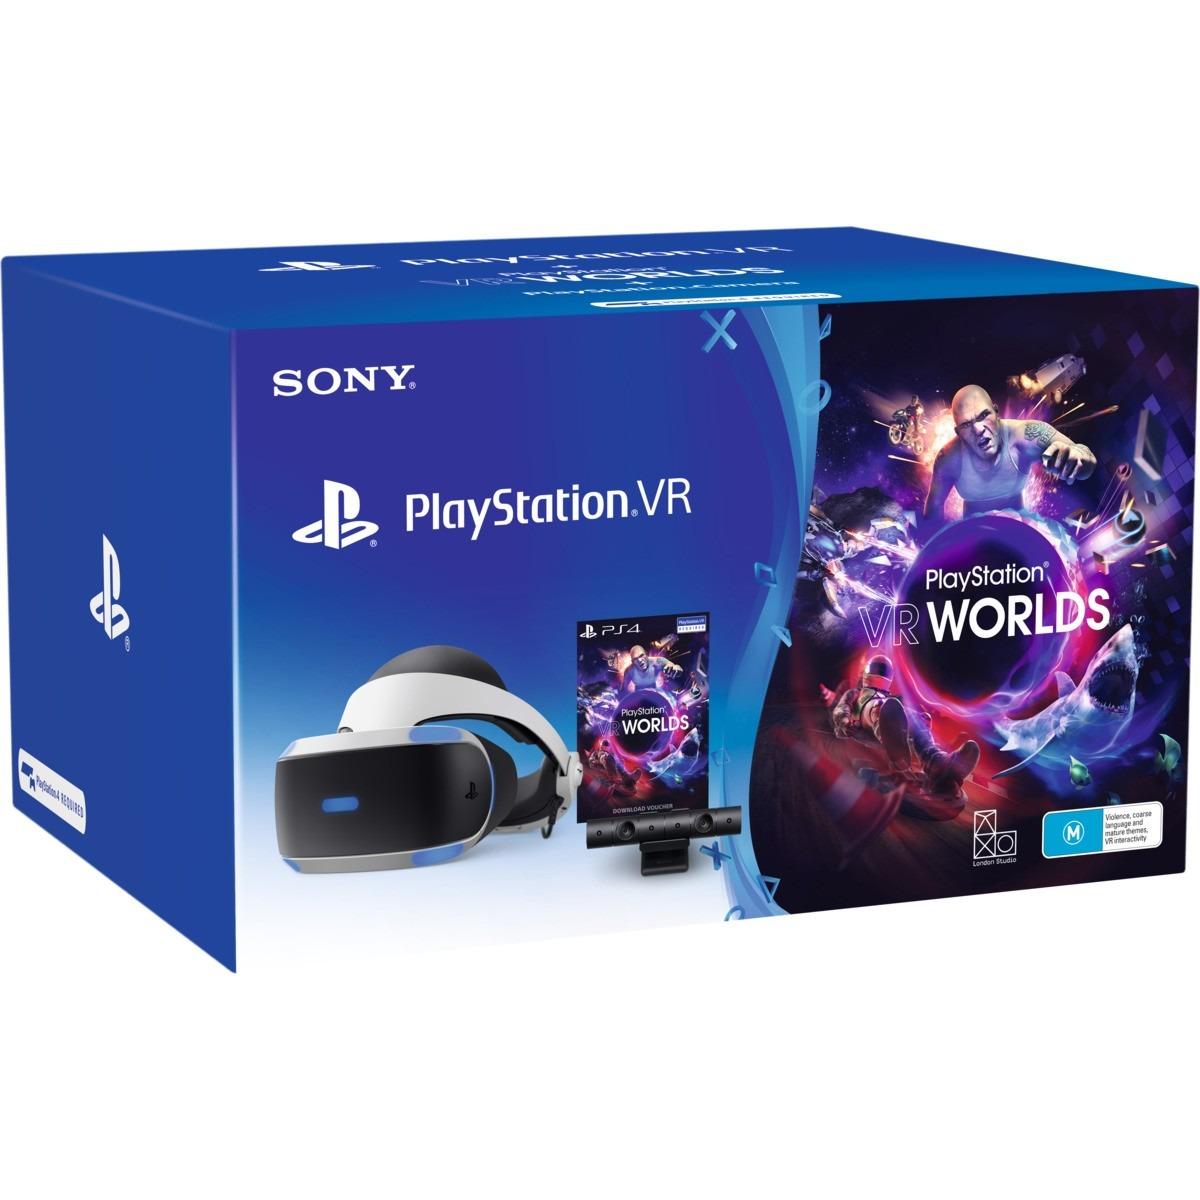 PlayStation VR + kamera + VR Worlds (PS4)